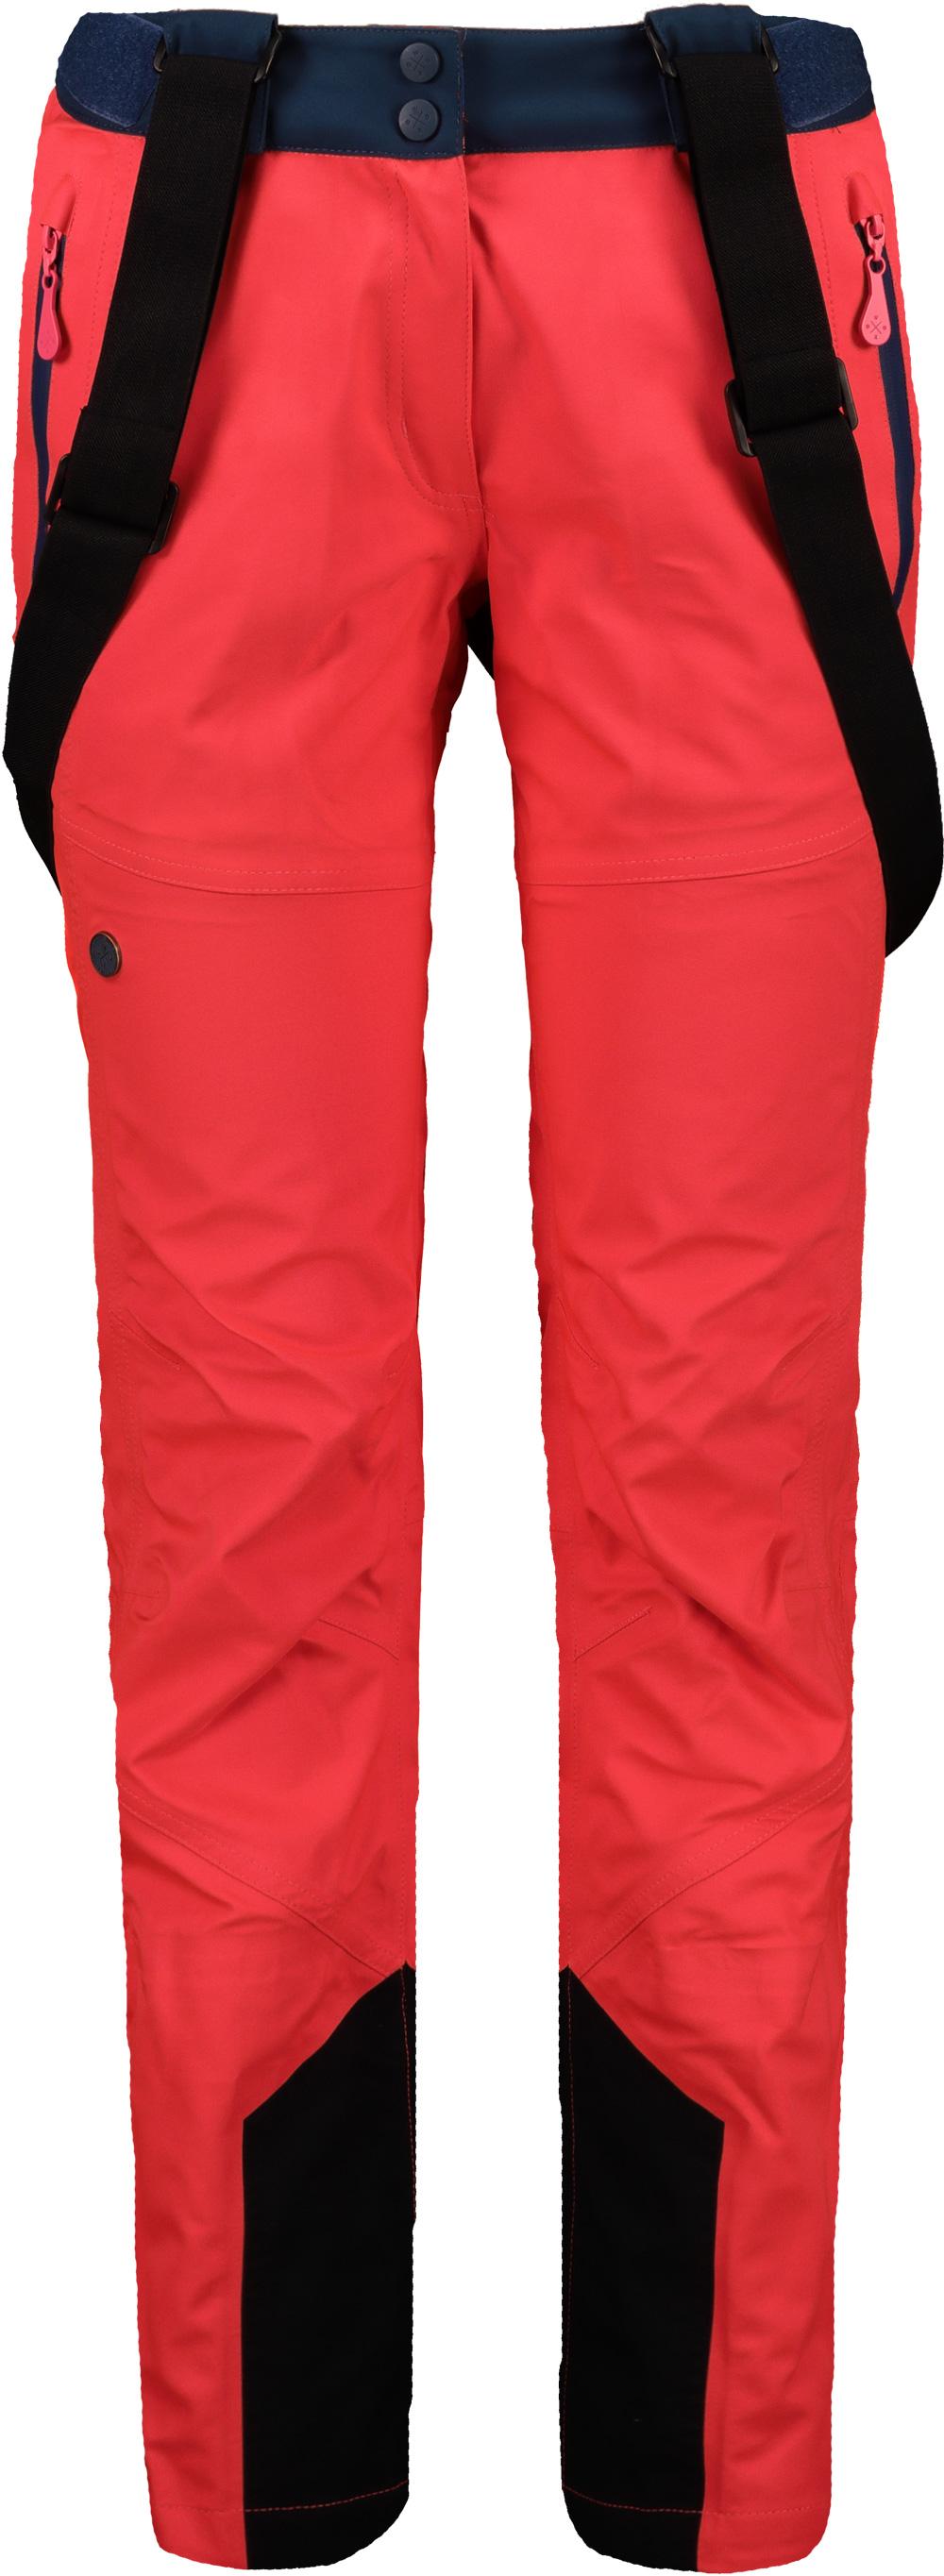 Lyžařské kalhoty dámské WOOX Braccis Lanula